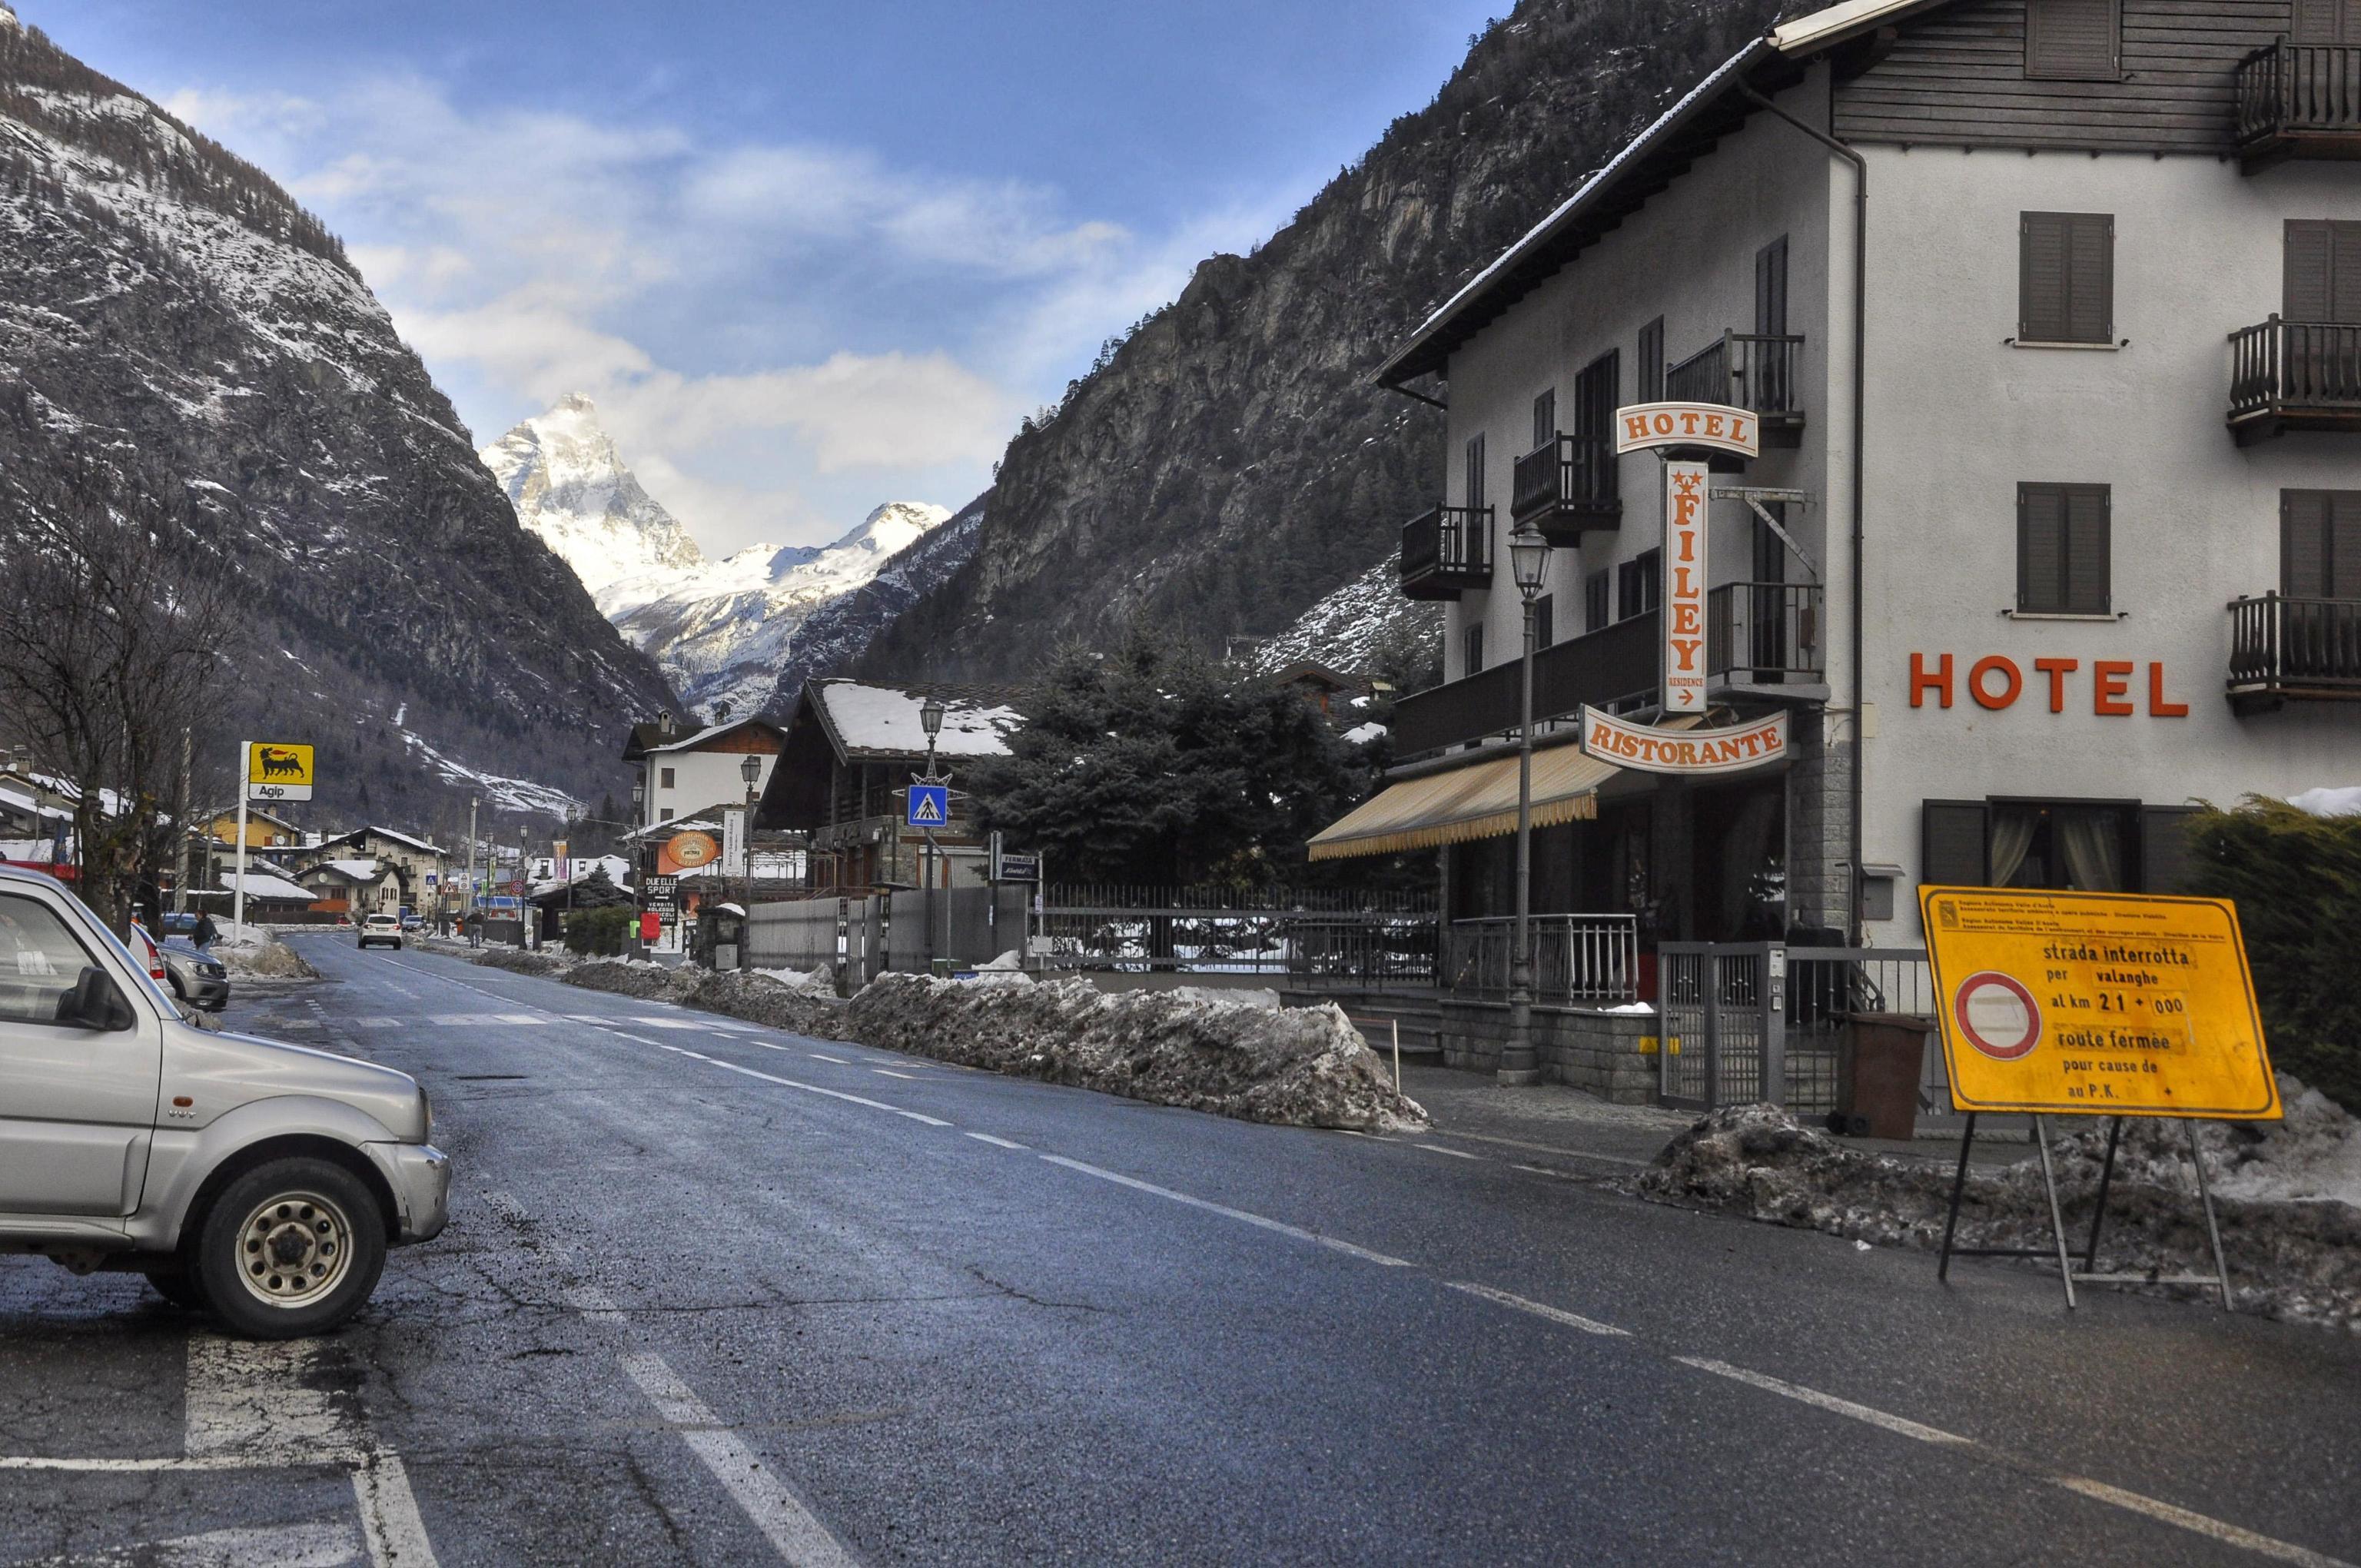 Valle D'Aosta - Chiuse tutte le strade per Cervinia per rischio valanghe